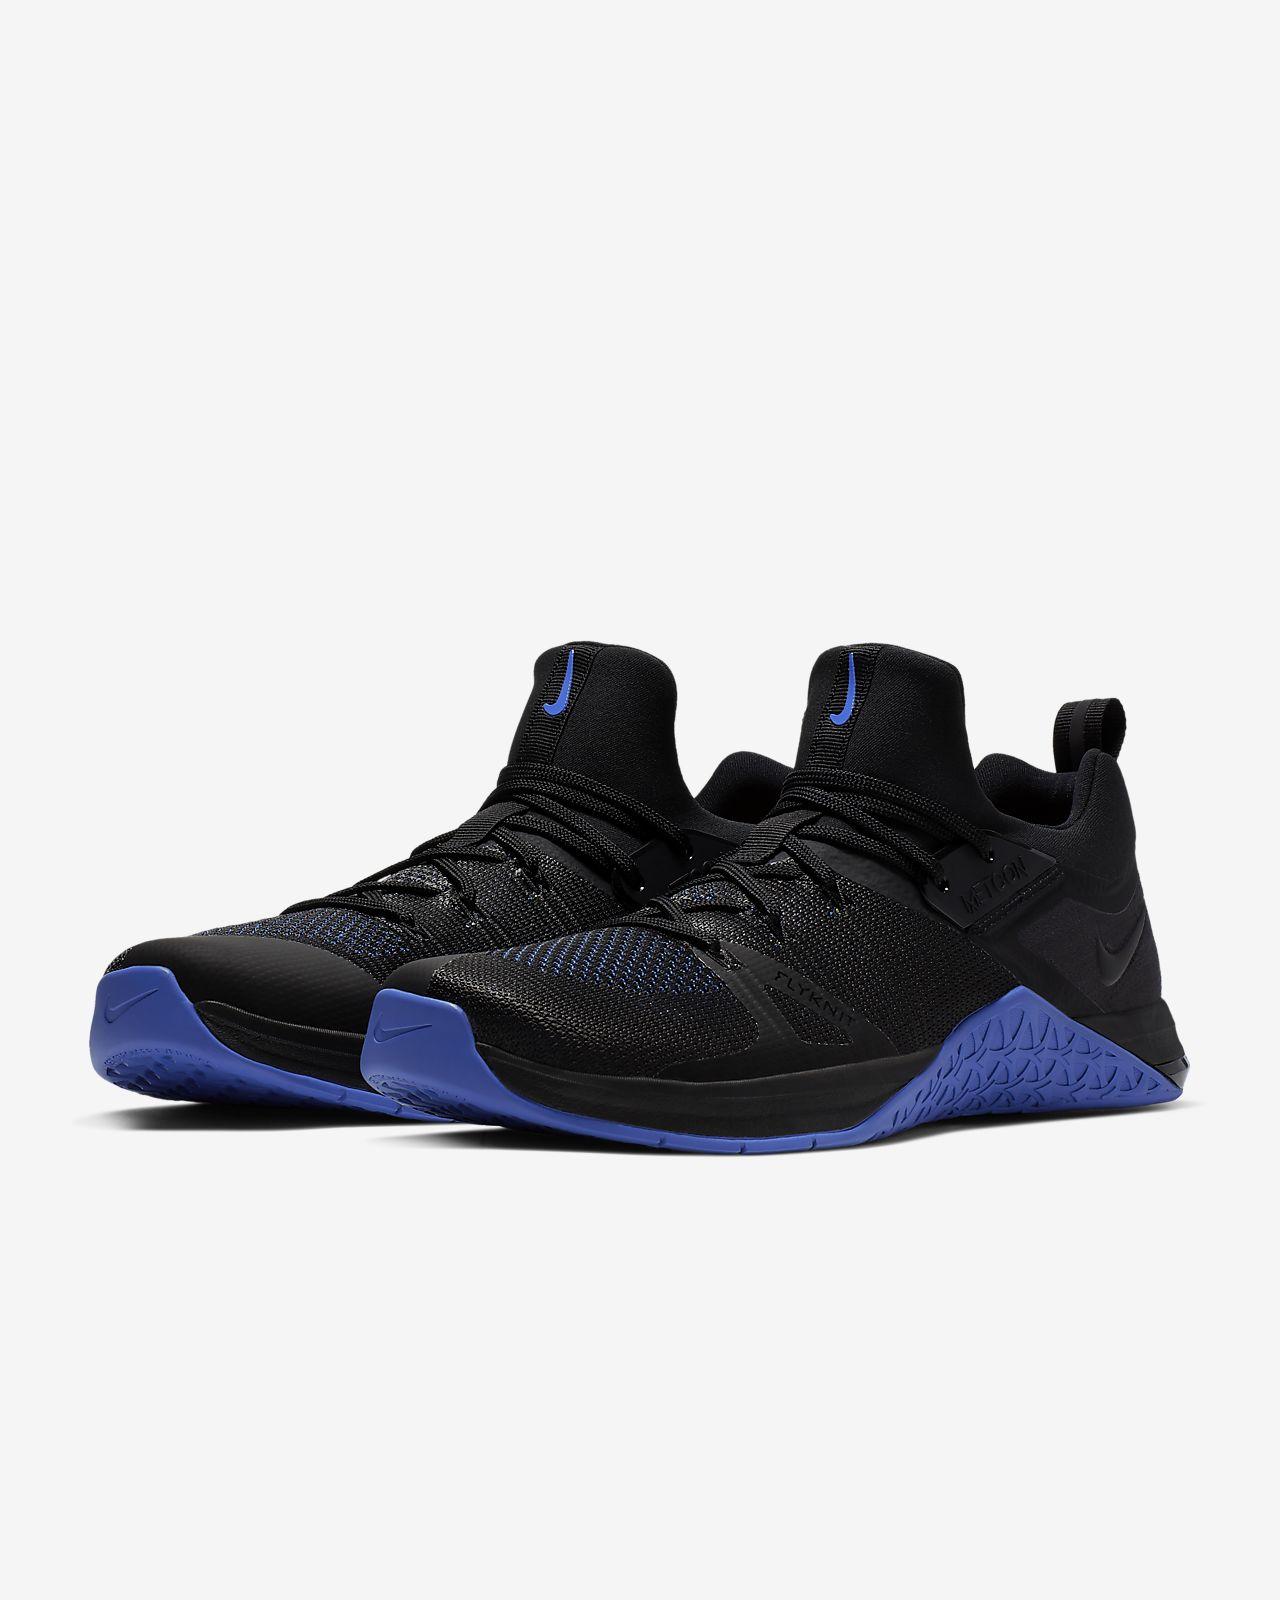 ed50ef0e845c Nike Metcon Flyknit 3 Men s Cross-Training Weightlifting Shoe. Nike ...